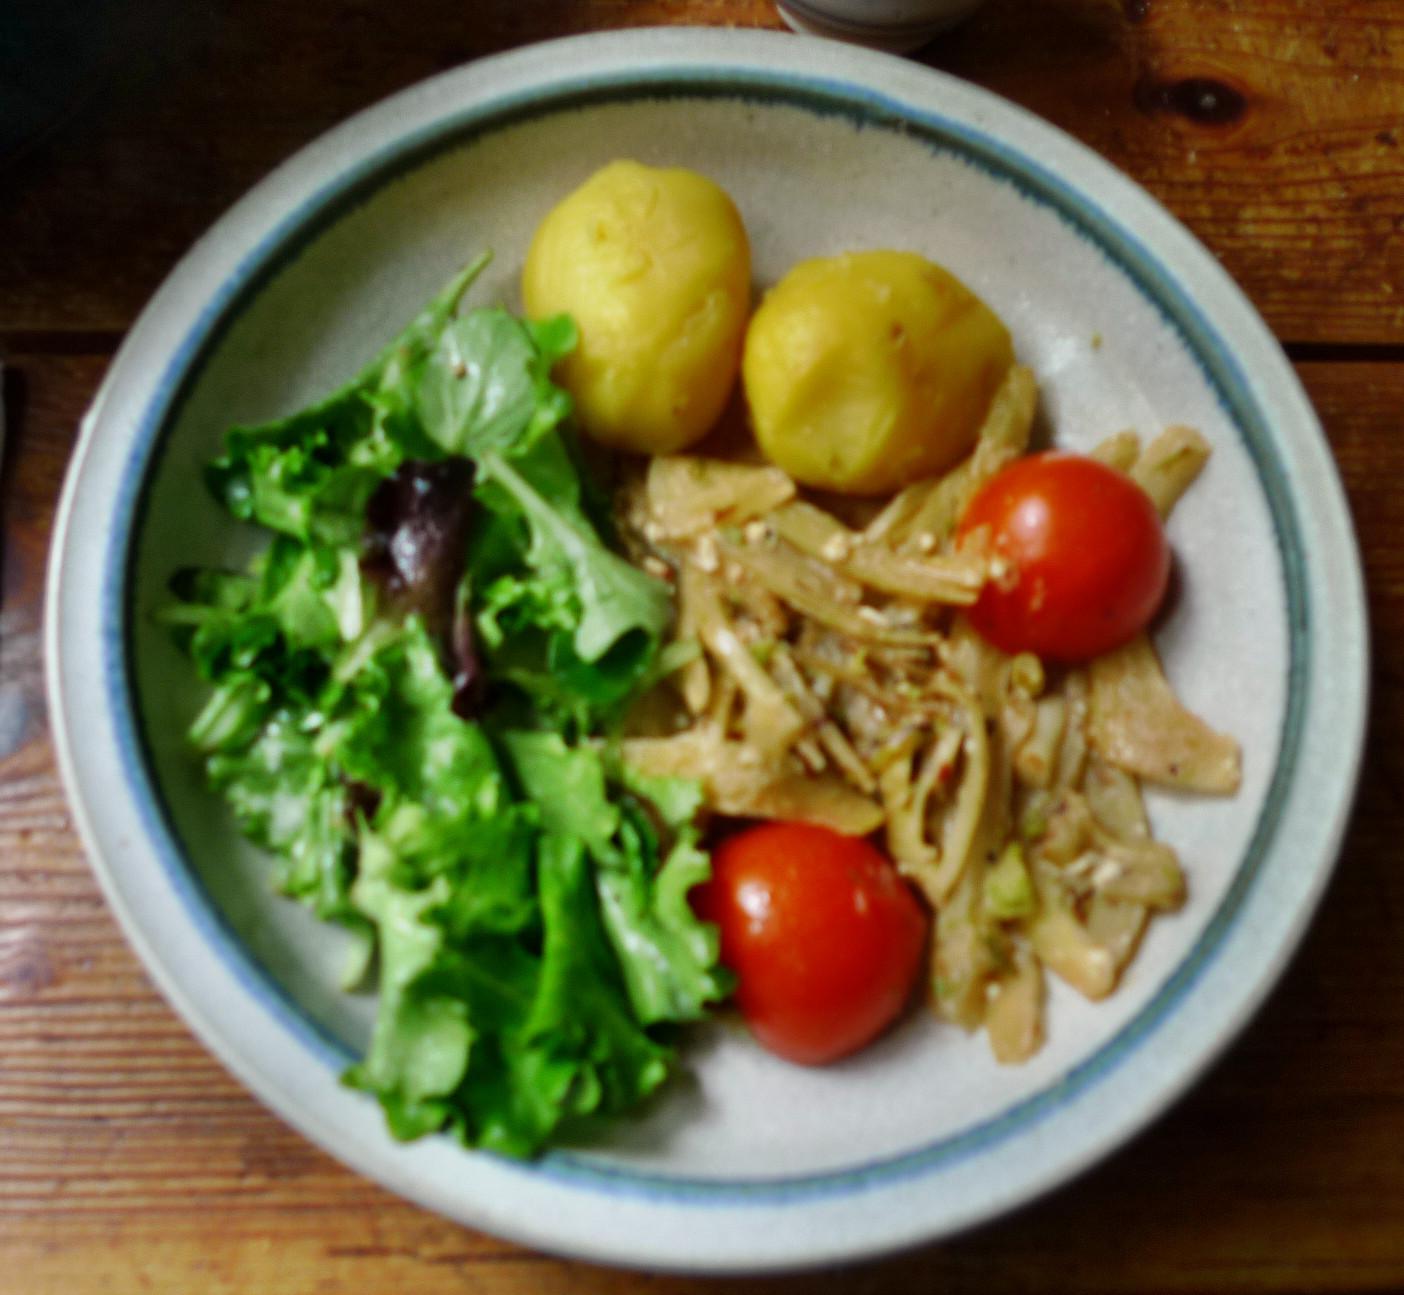 Fenchelgemüse,Kartoffeln,Salat -8..15   (11)